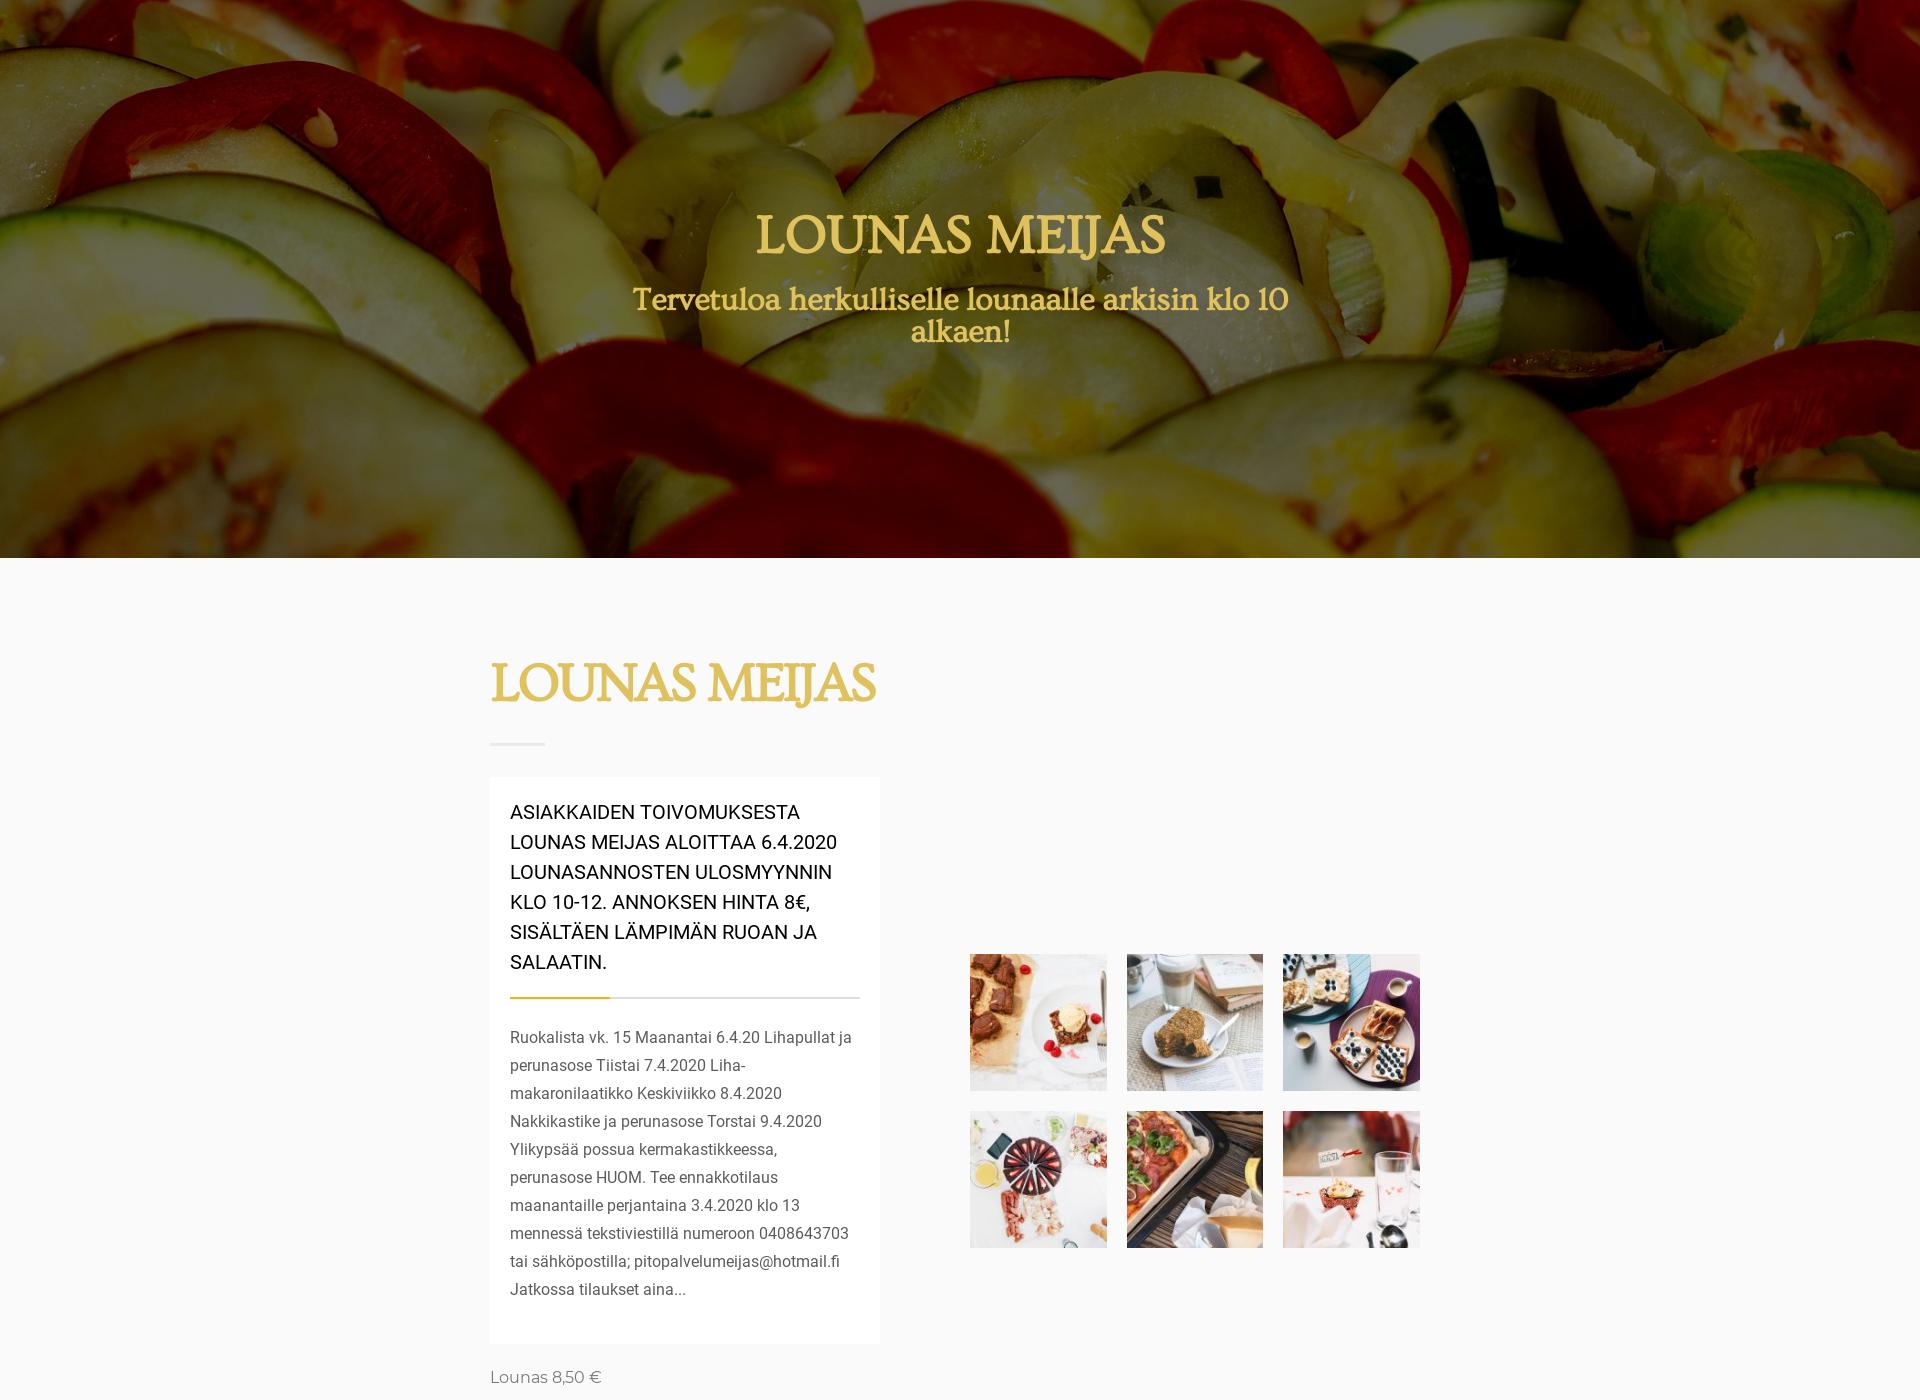 Screenshot for lounas-meijas.fi